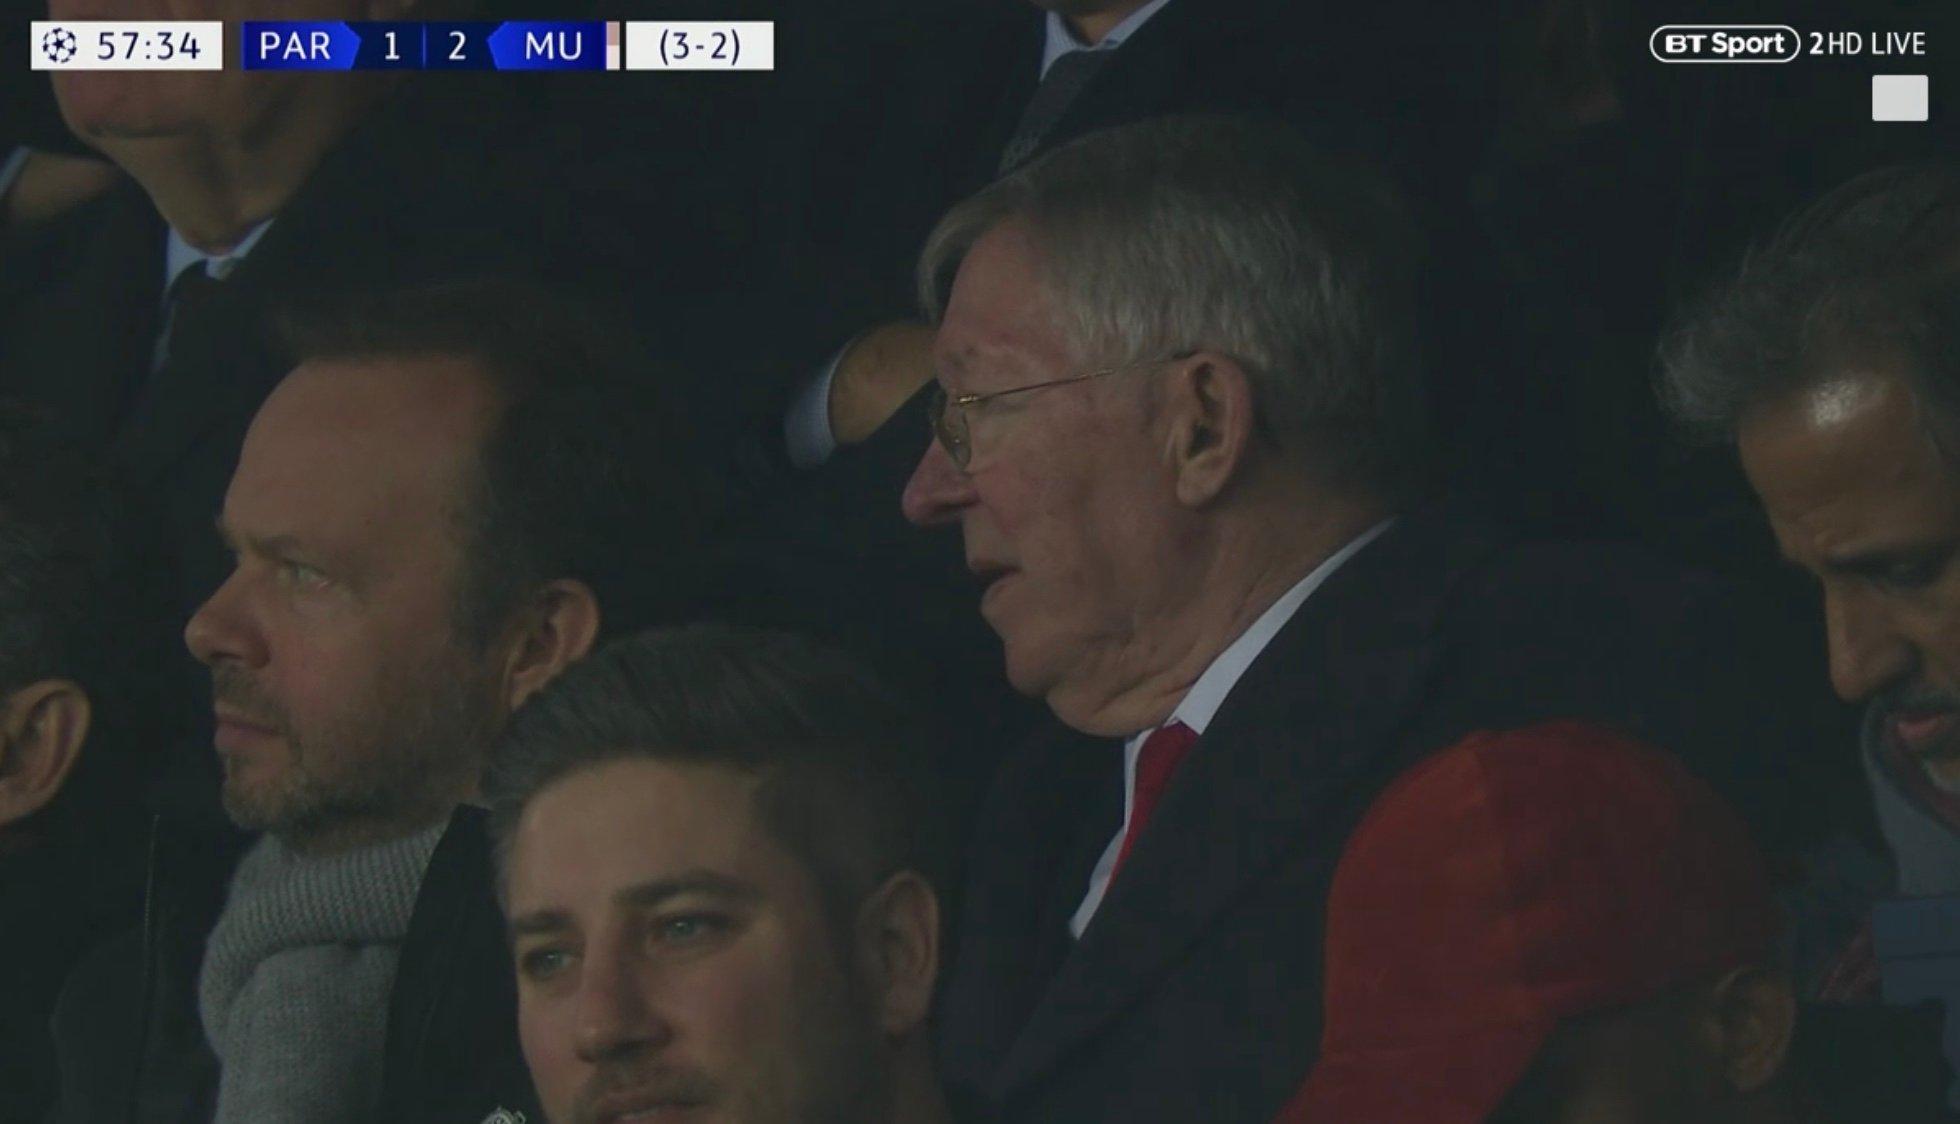 Sir Alex Ferguson (Photo: Screen grab / BT Sport)